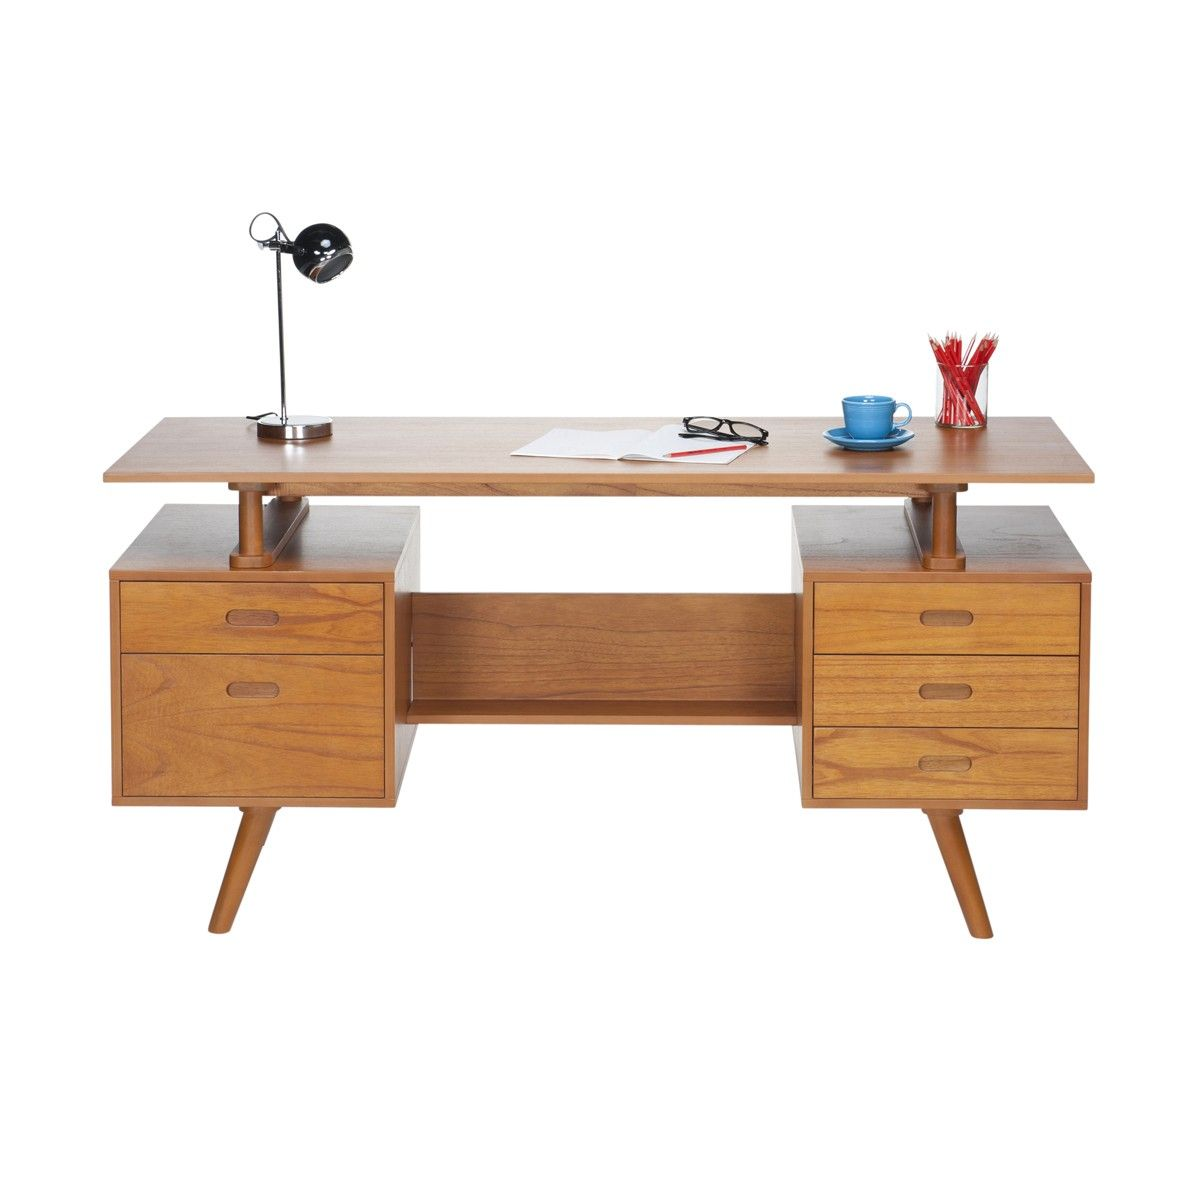 retro office desks. Home Office Desk - Buy Retro Josephine \u2013 Retrojan . Desks